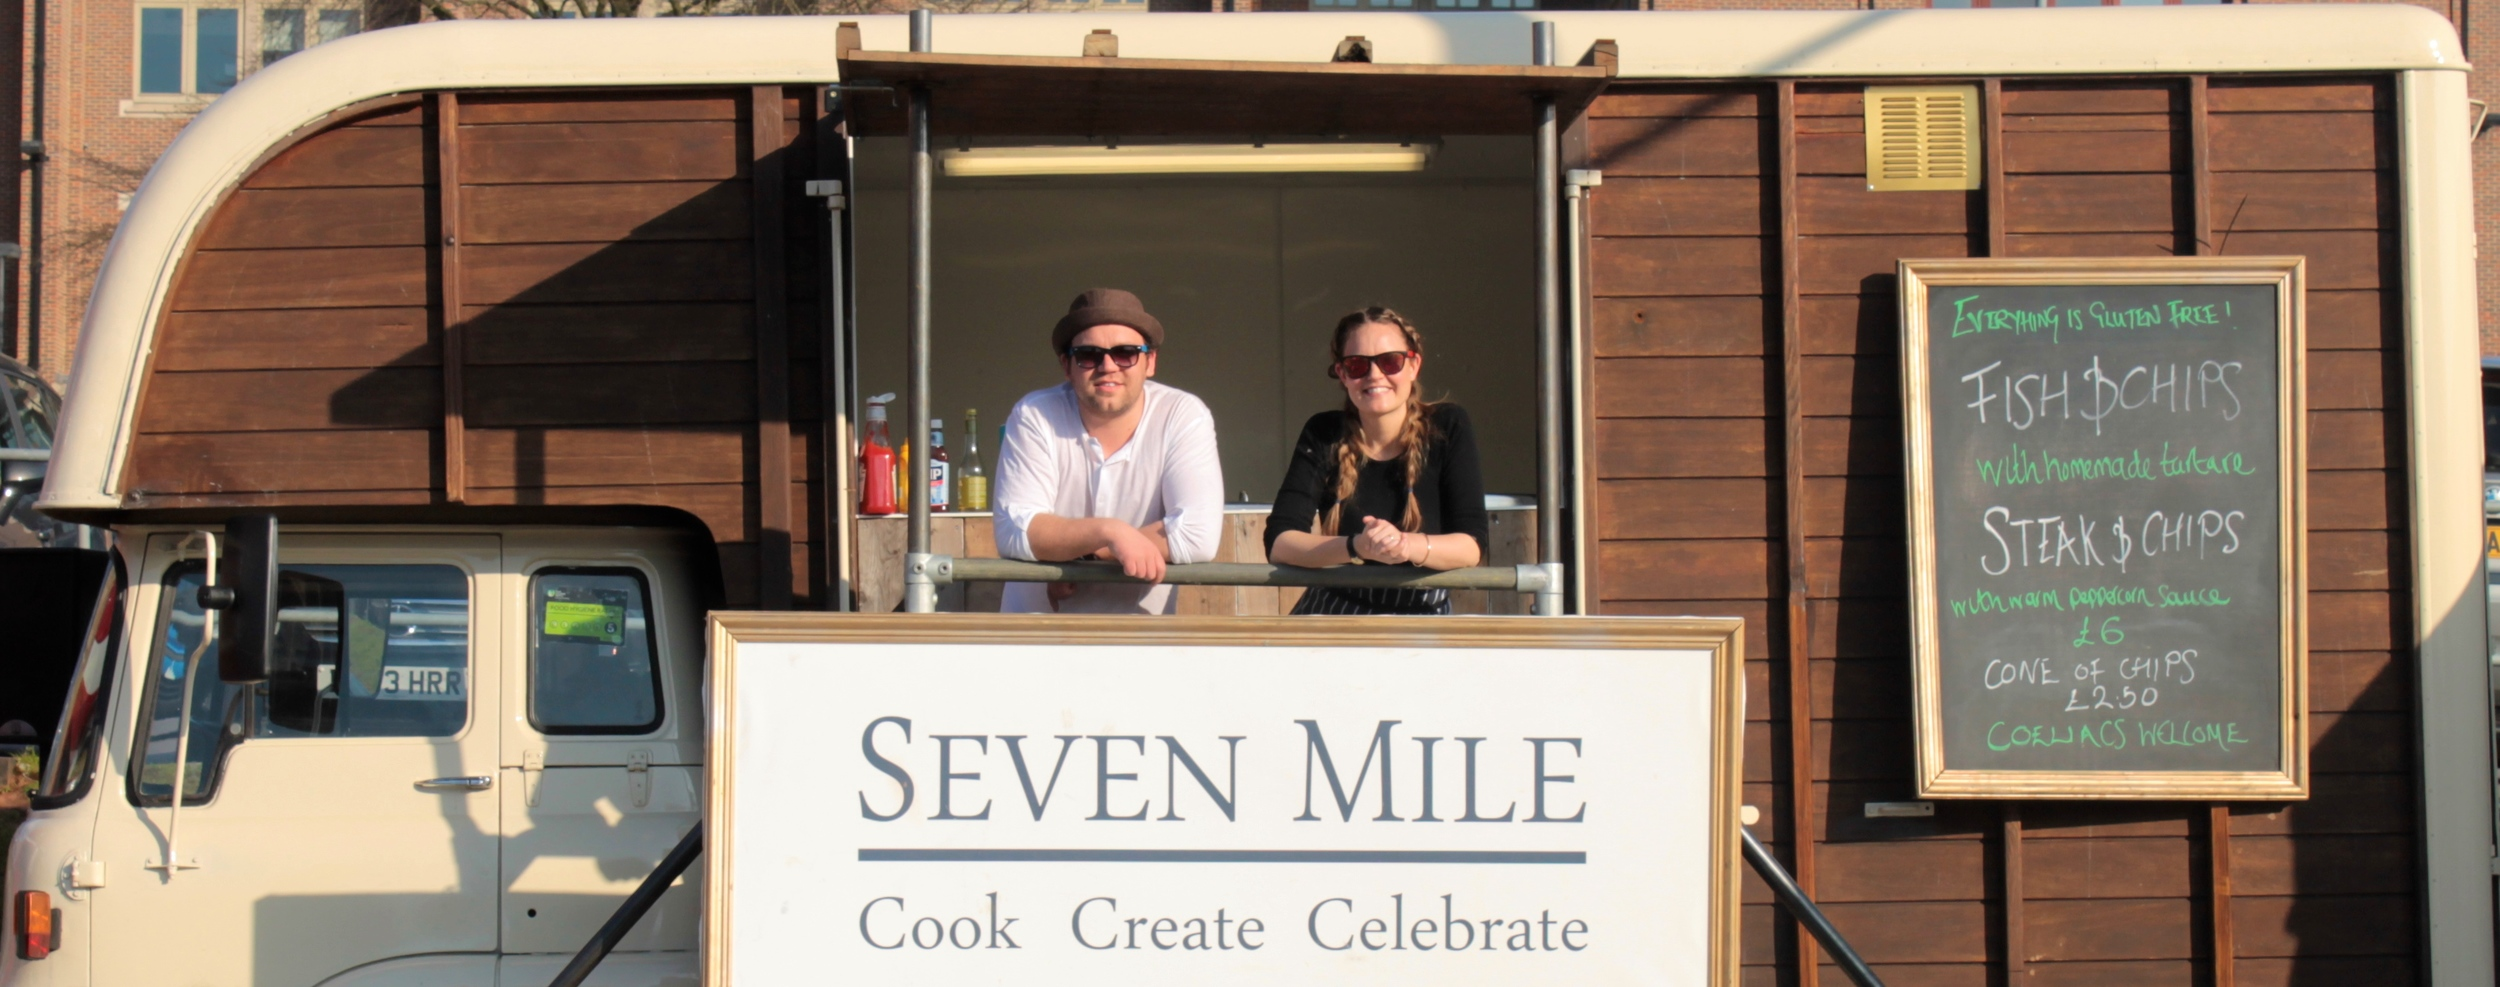 Seven Mile - Food Truck - Bodhi, Jake and Janine